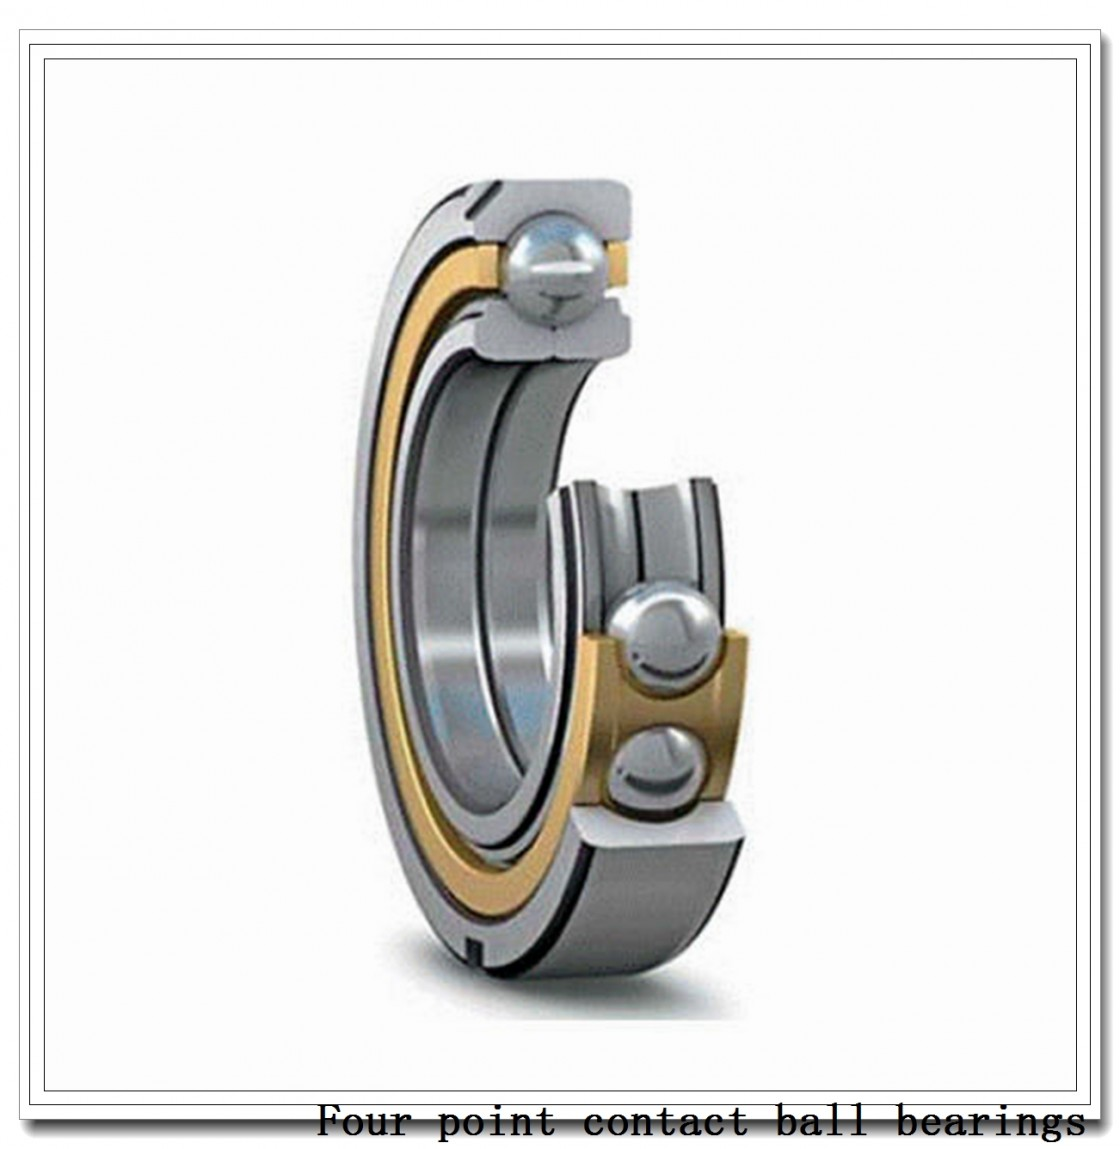 QJ336N2MA Four point contact ball bearings